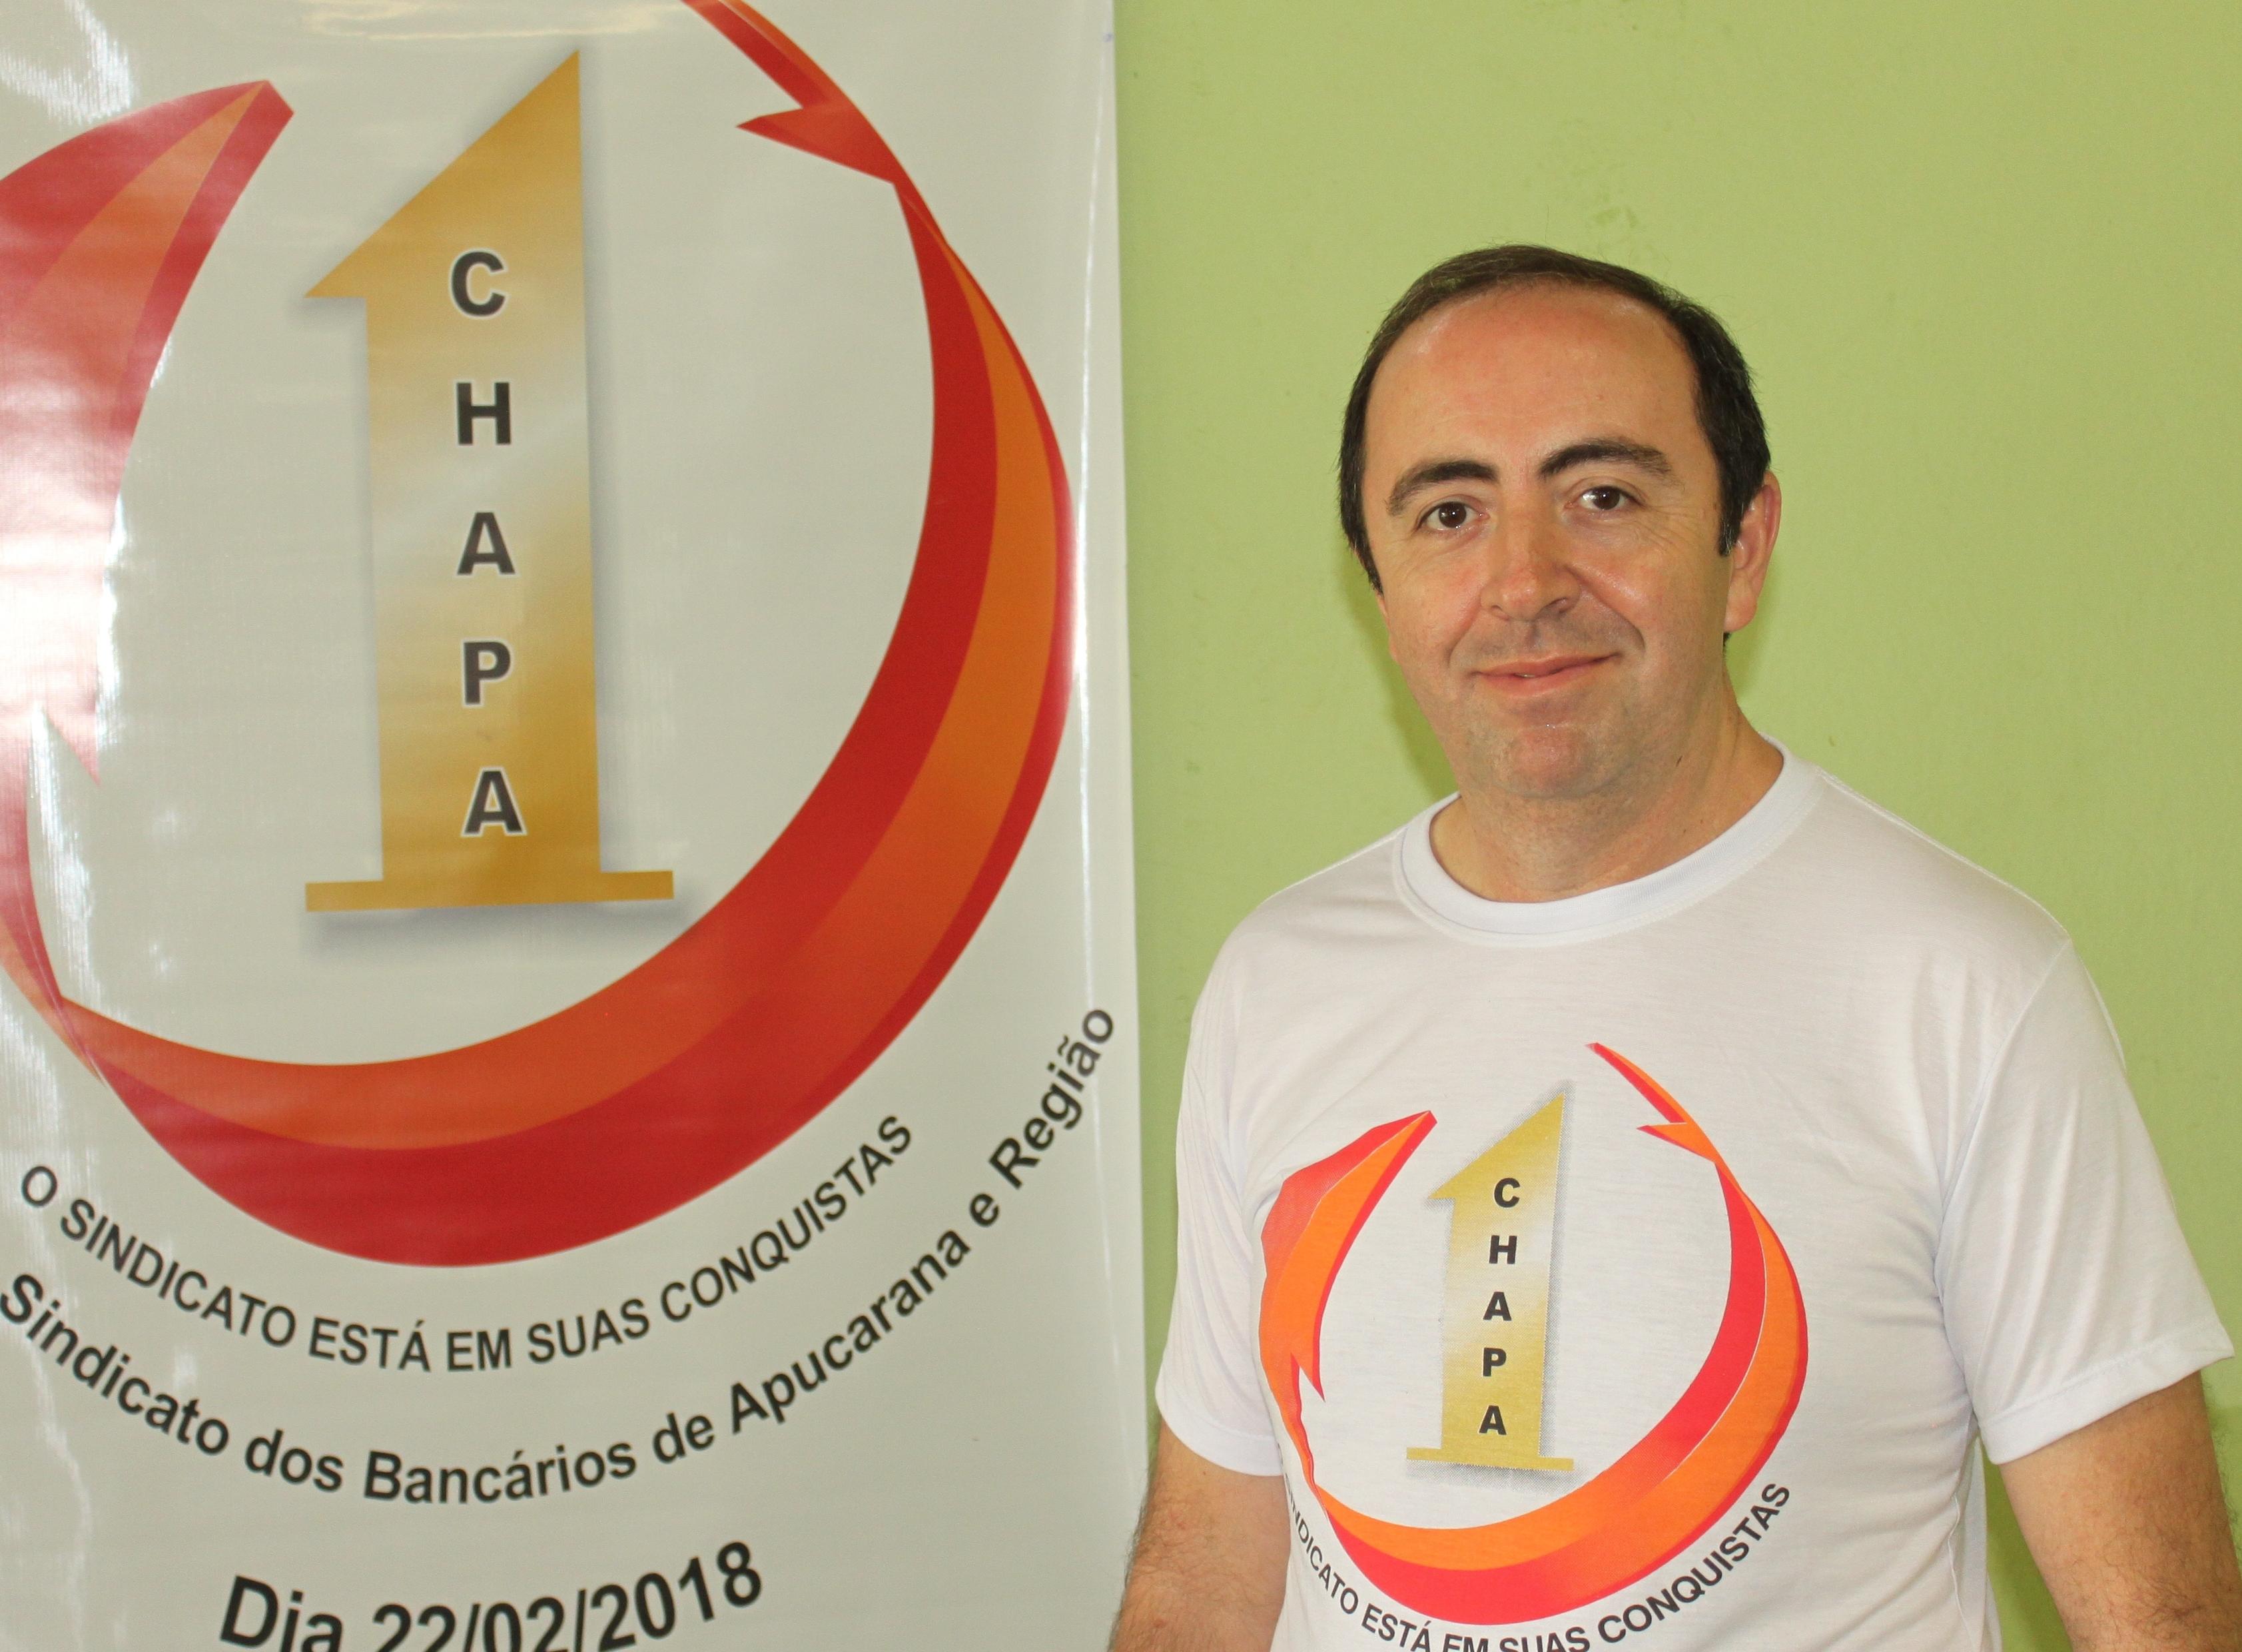 Henrique Segantini da Silva - Diretoria Suplente Itaú Jandaia do Sul